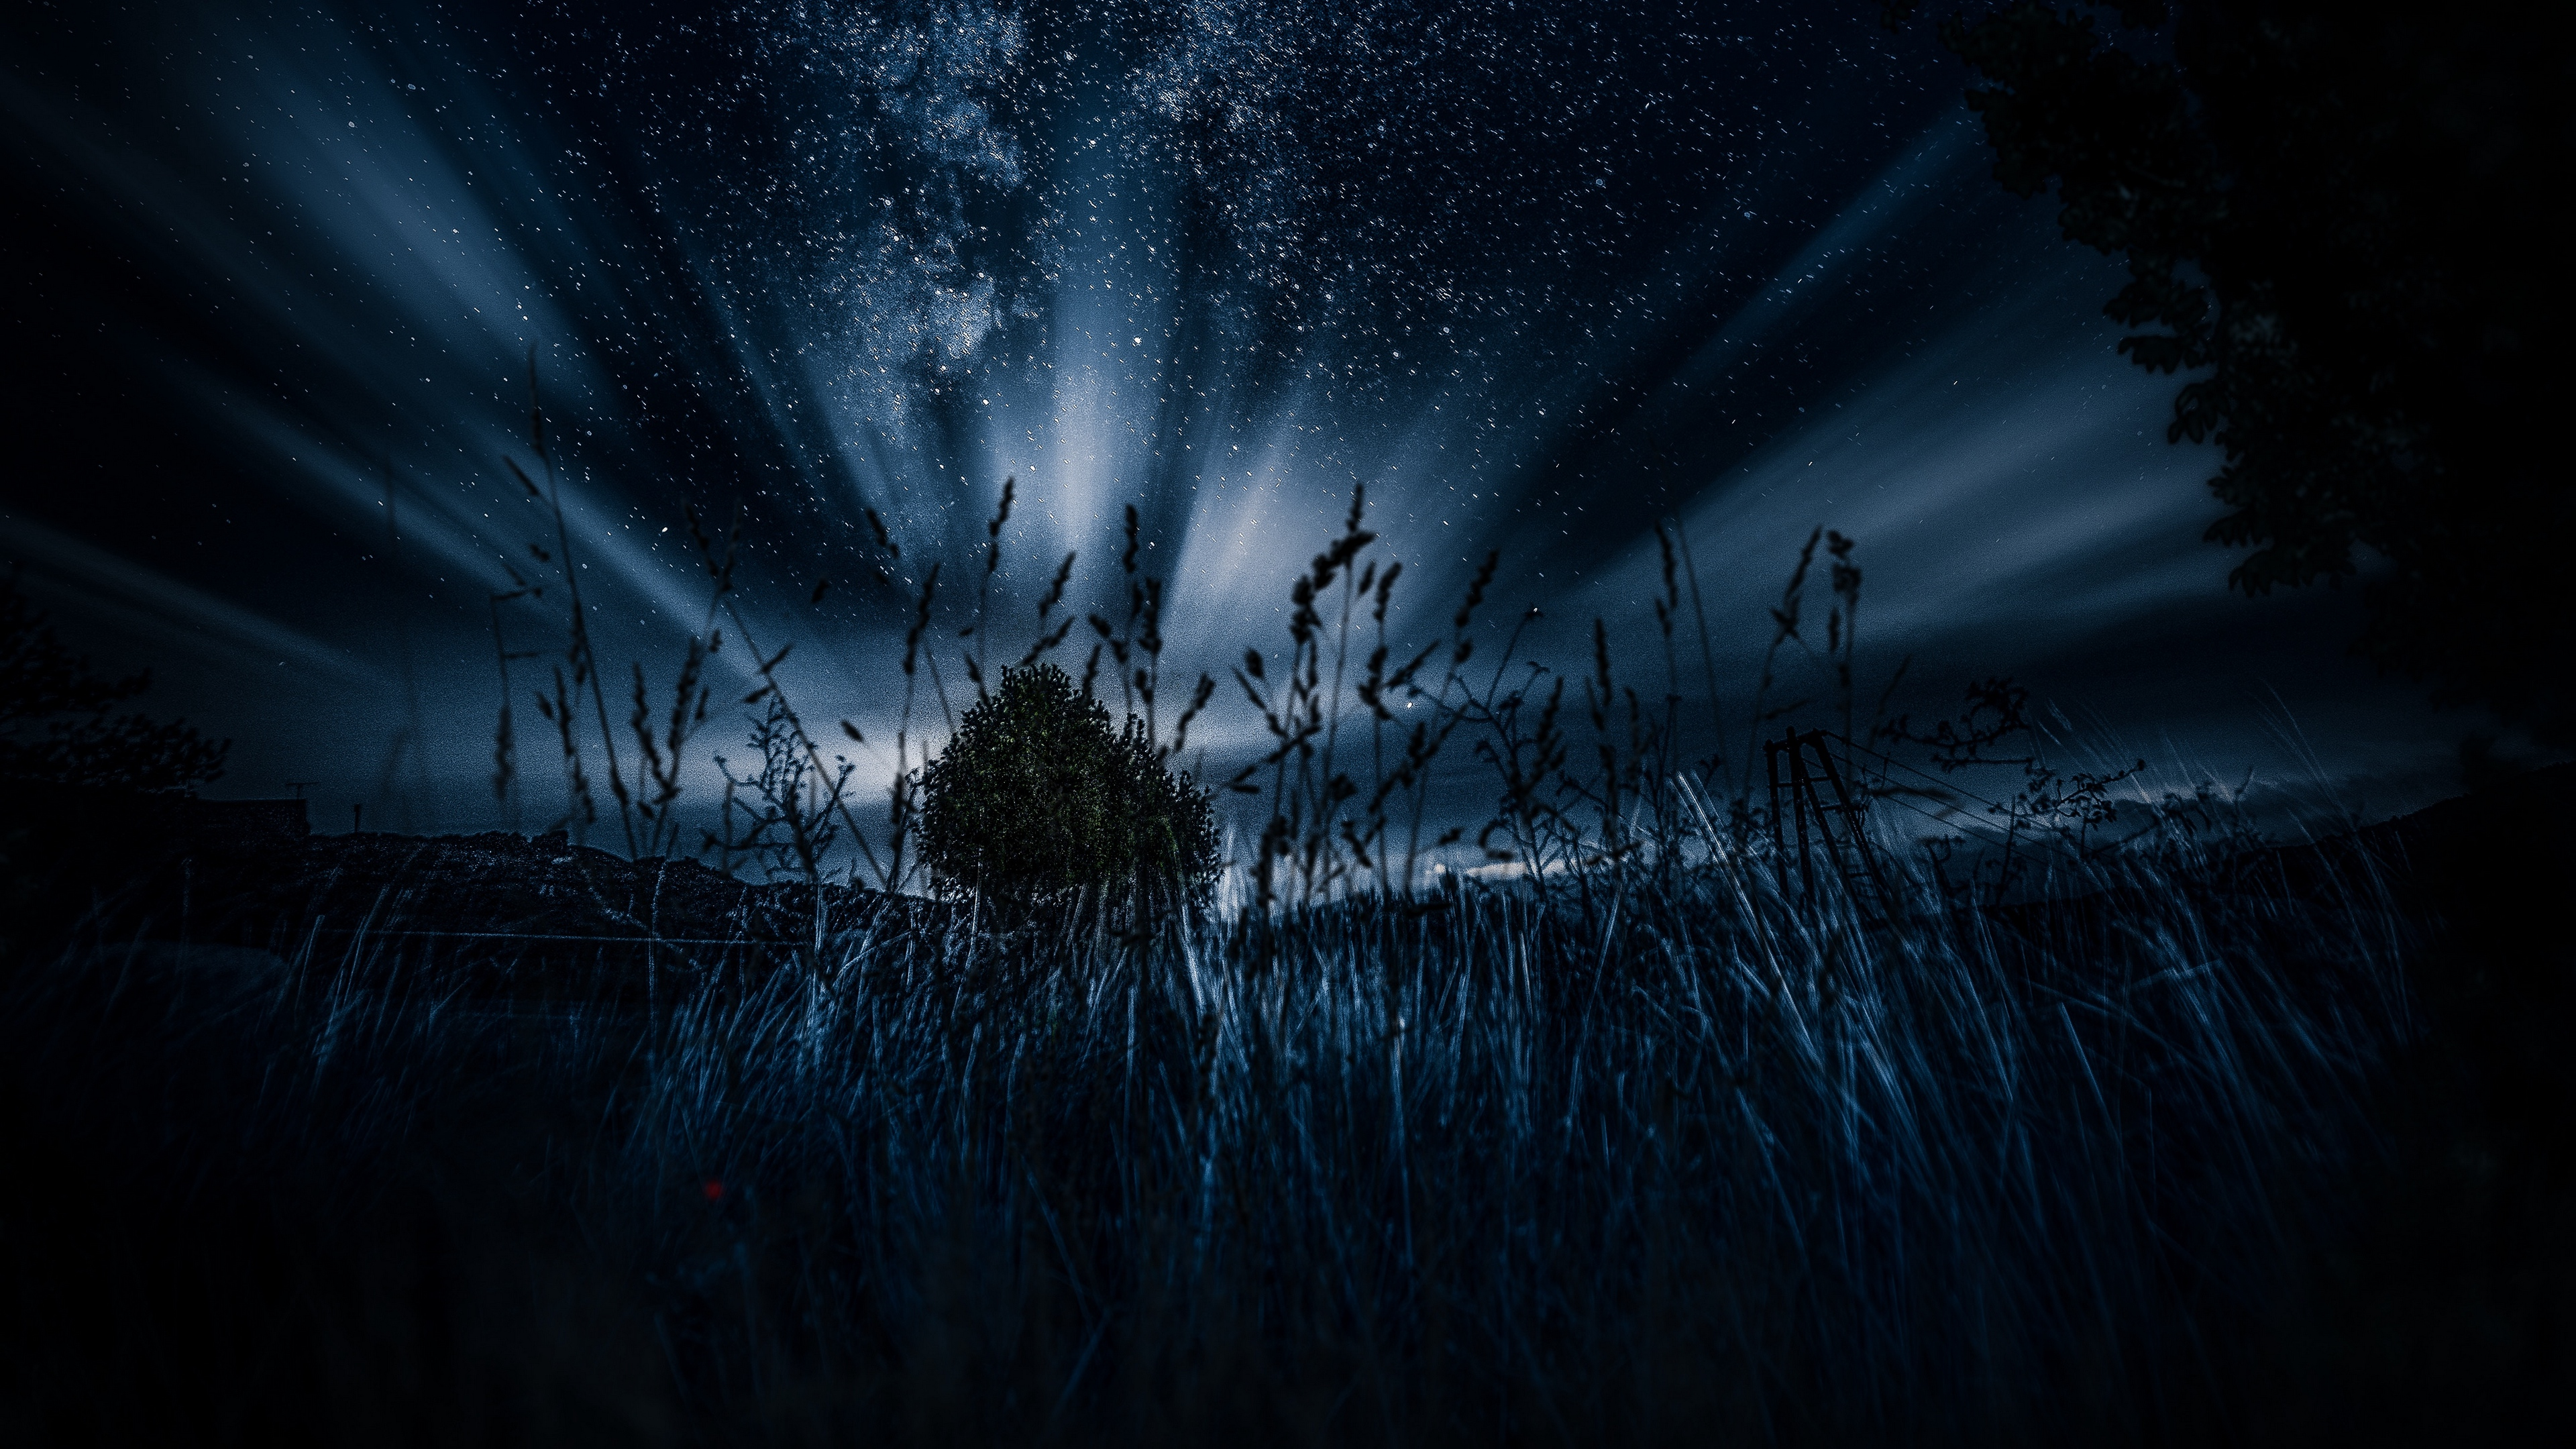 starry sky tree grass night 4k 1540575590 - starry sky, tree, grass, night 4k - tree, starry sky, Grass